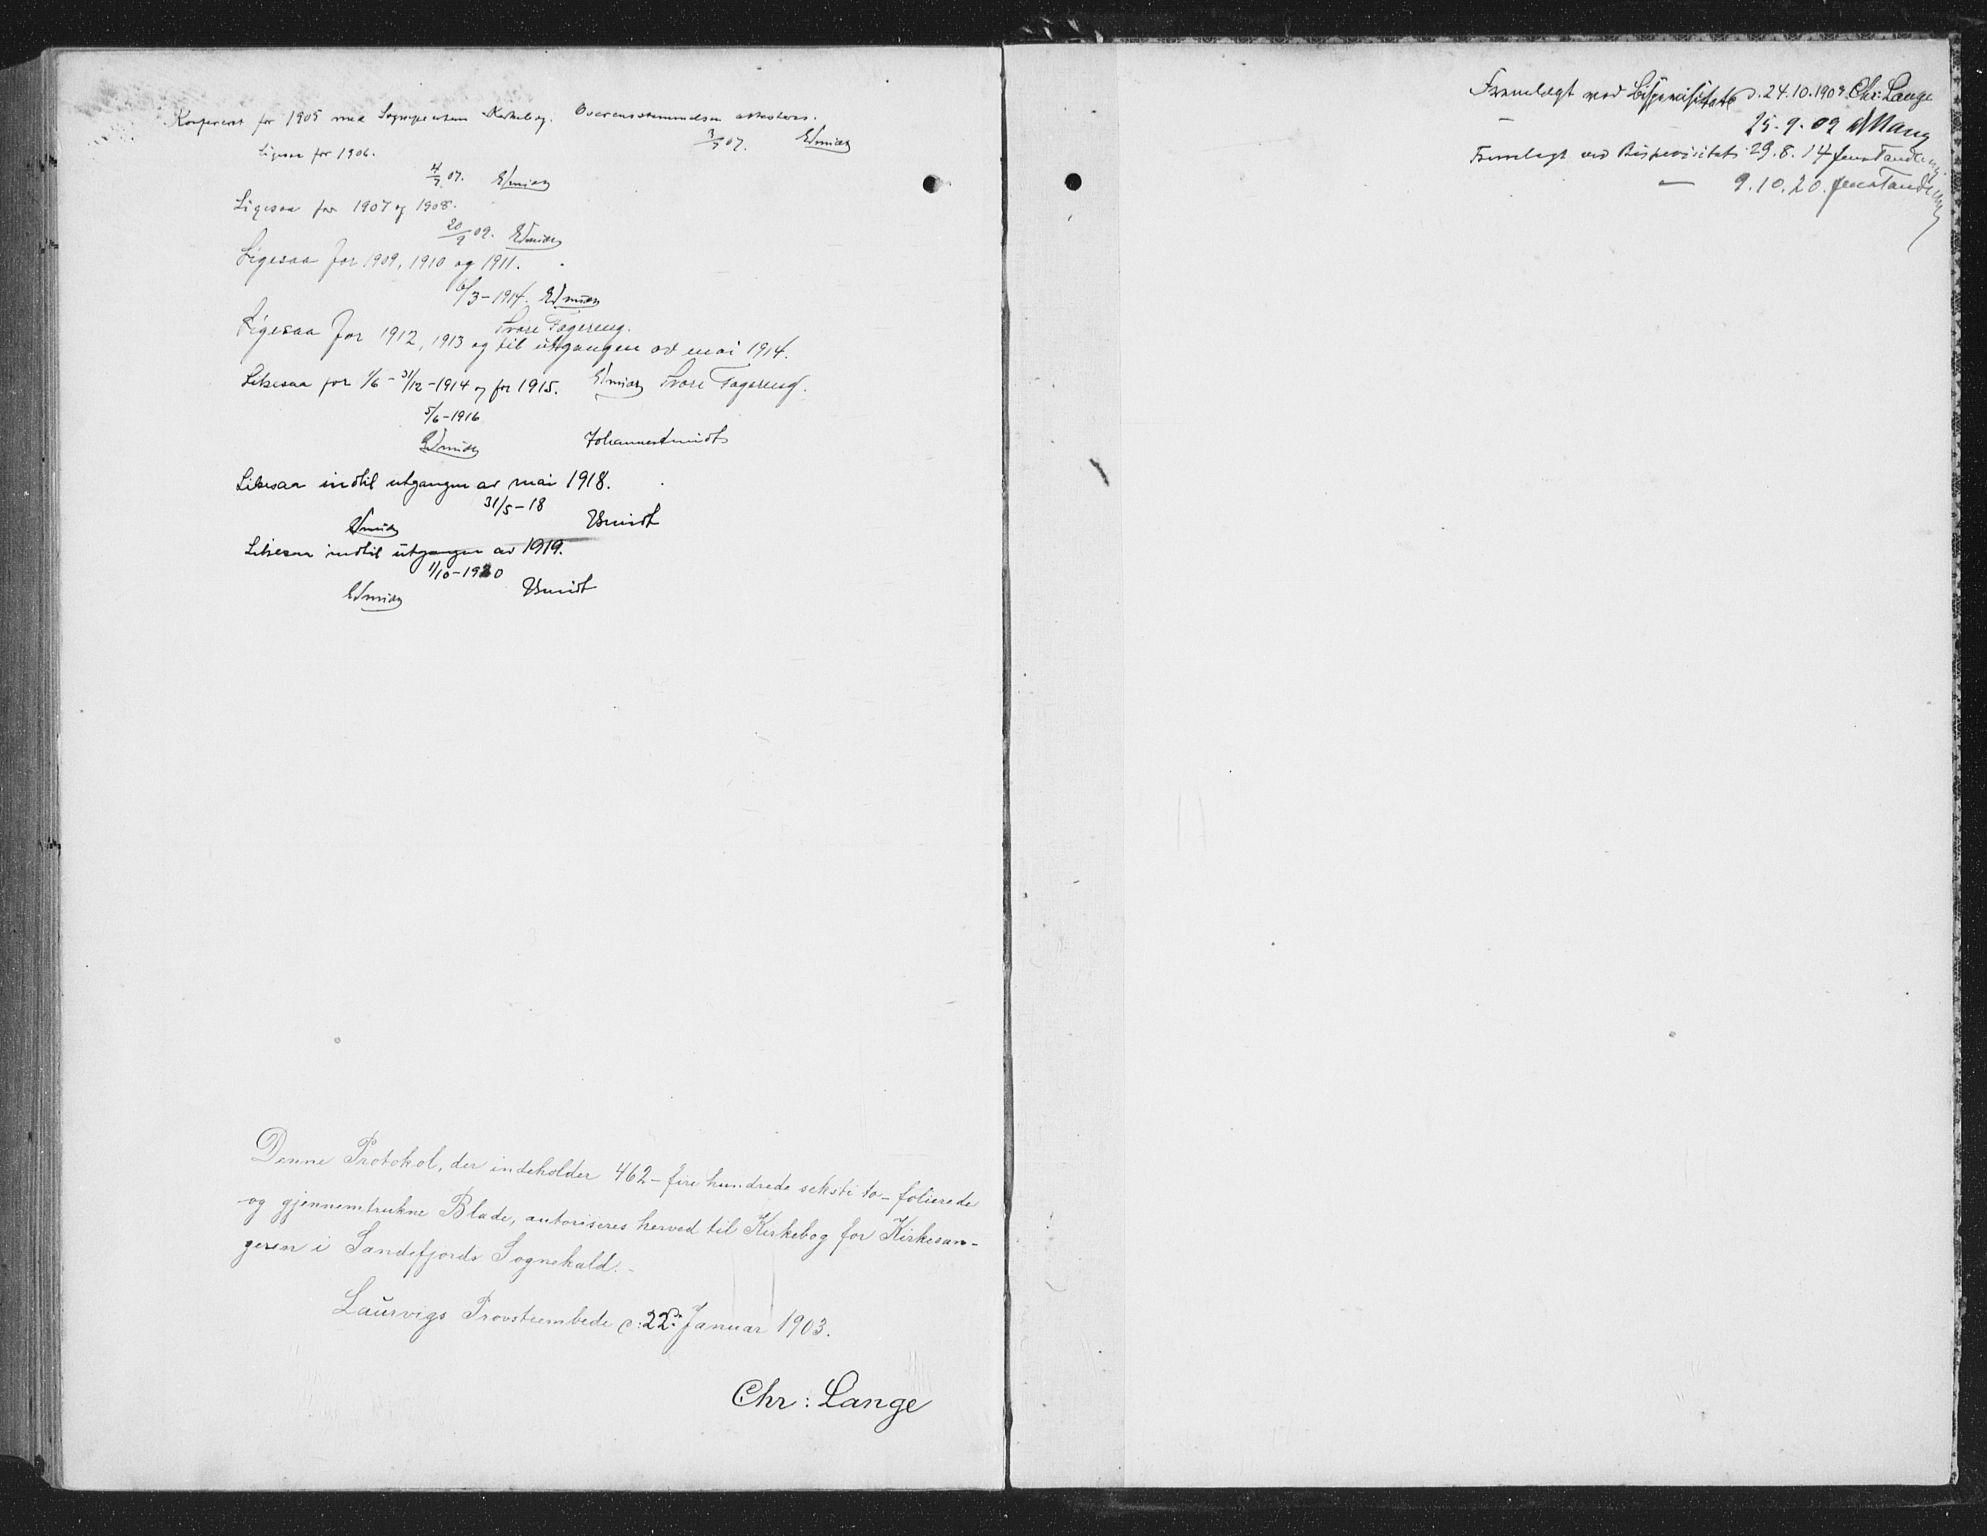 SAKO, Sandefjord kirkebøker, G/Ga/L0003: Klokkerbok nr. 3, 1903-1920